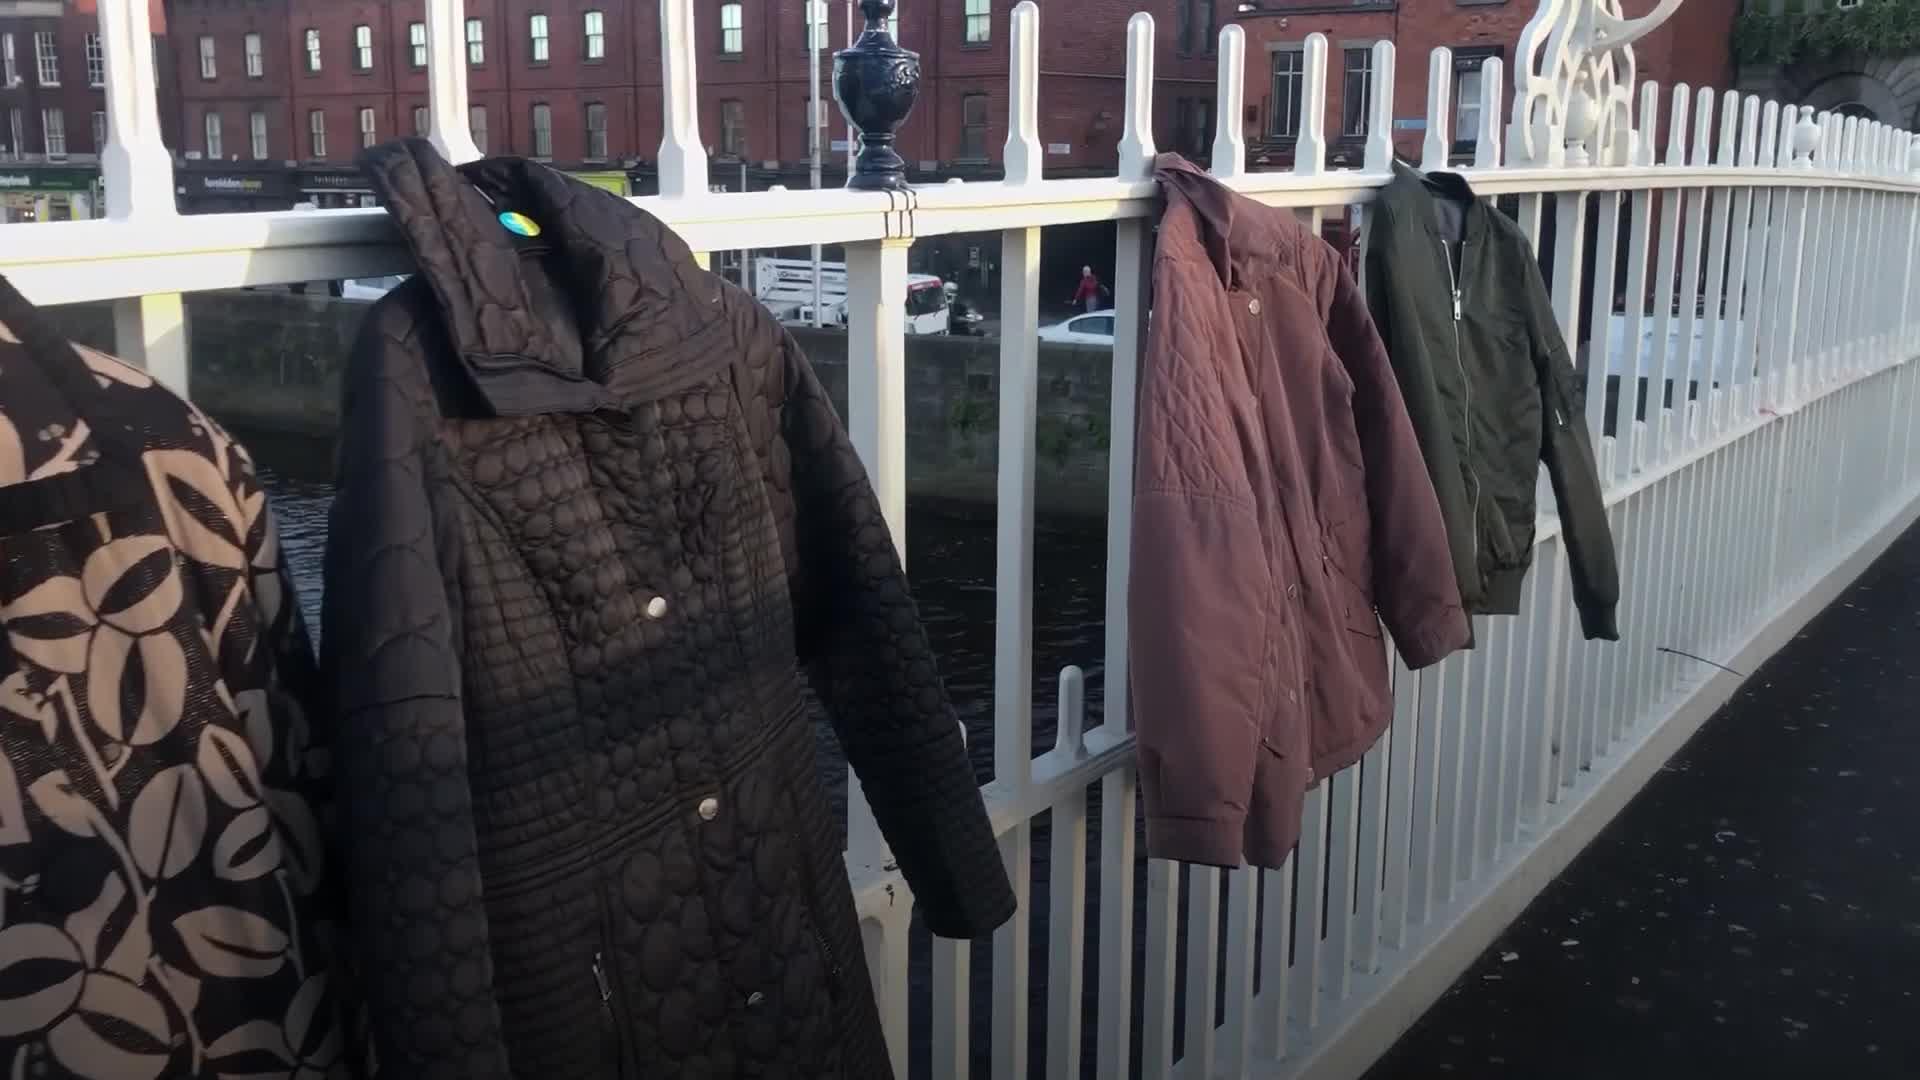 Warm for Winter charity hangs coats on Ha'penny Bridge Video